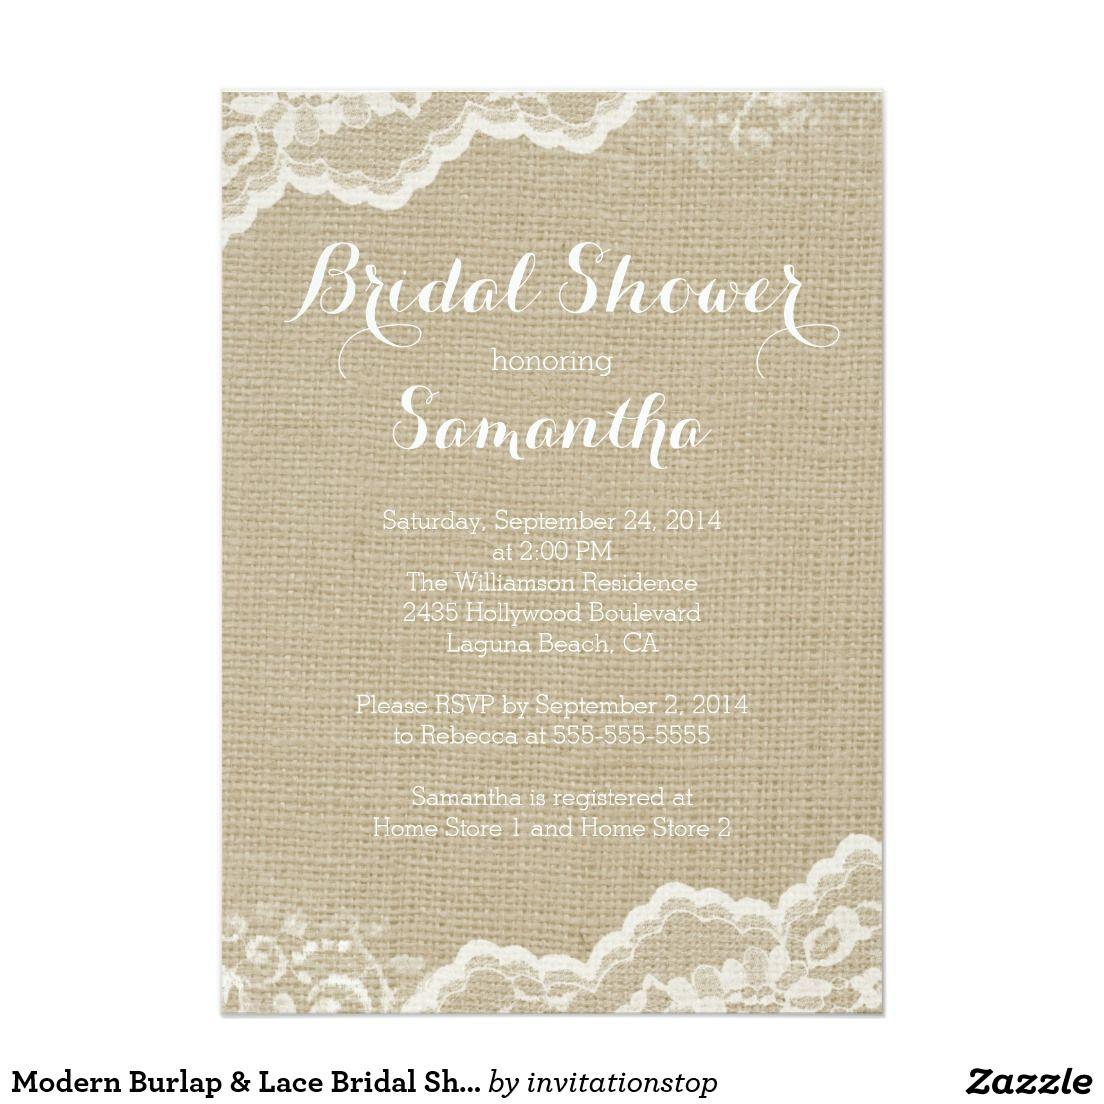 Modern Burlap & Lace Bridal Shower Invitation 5\